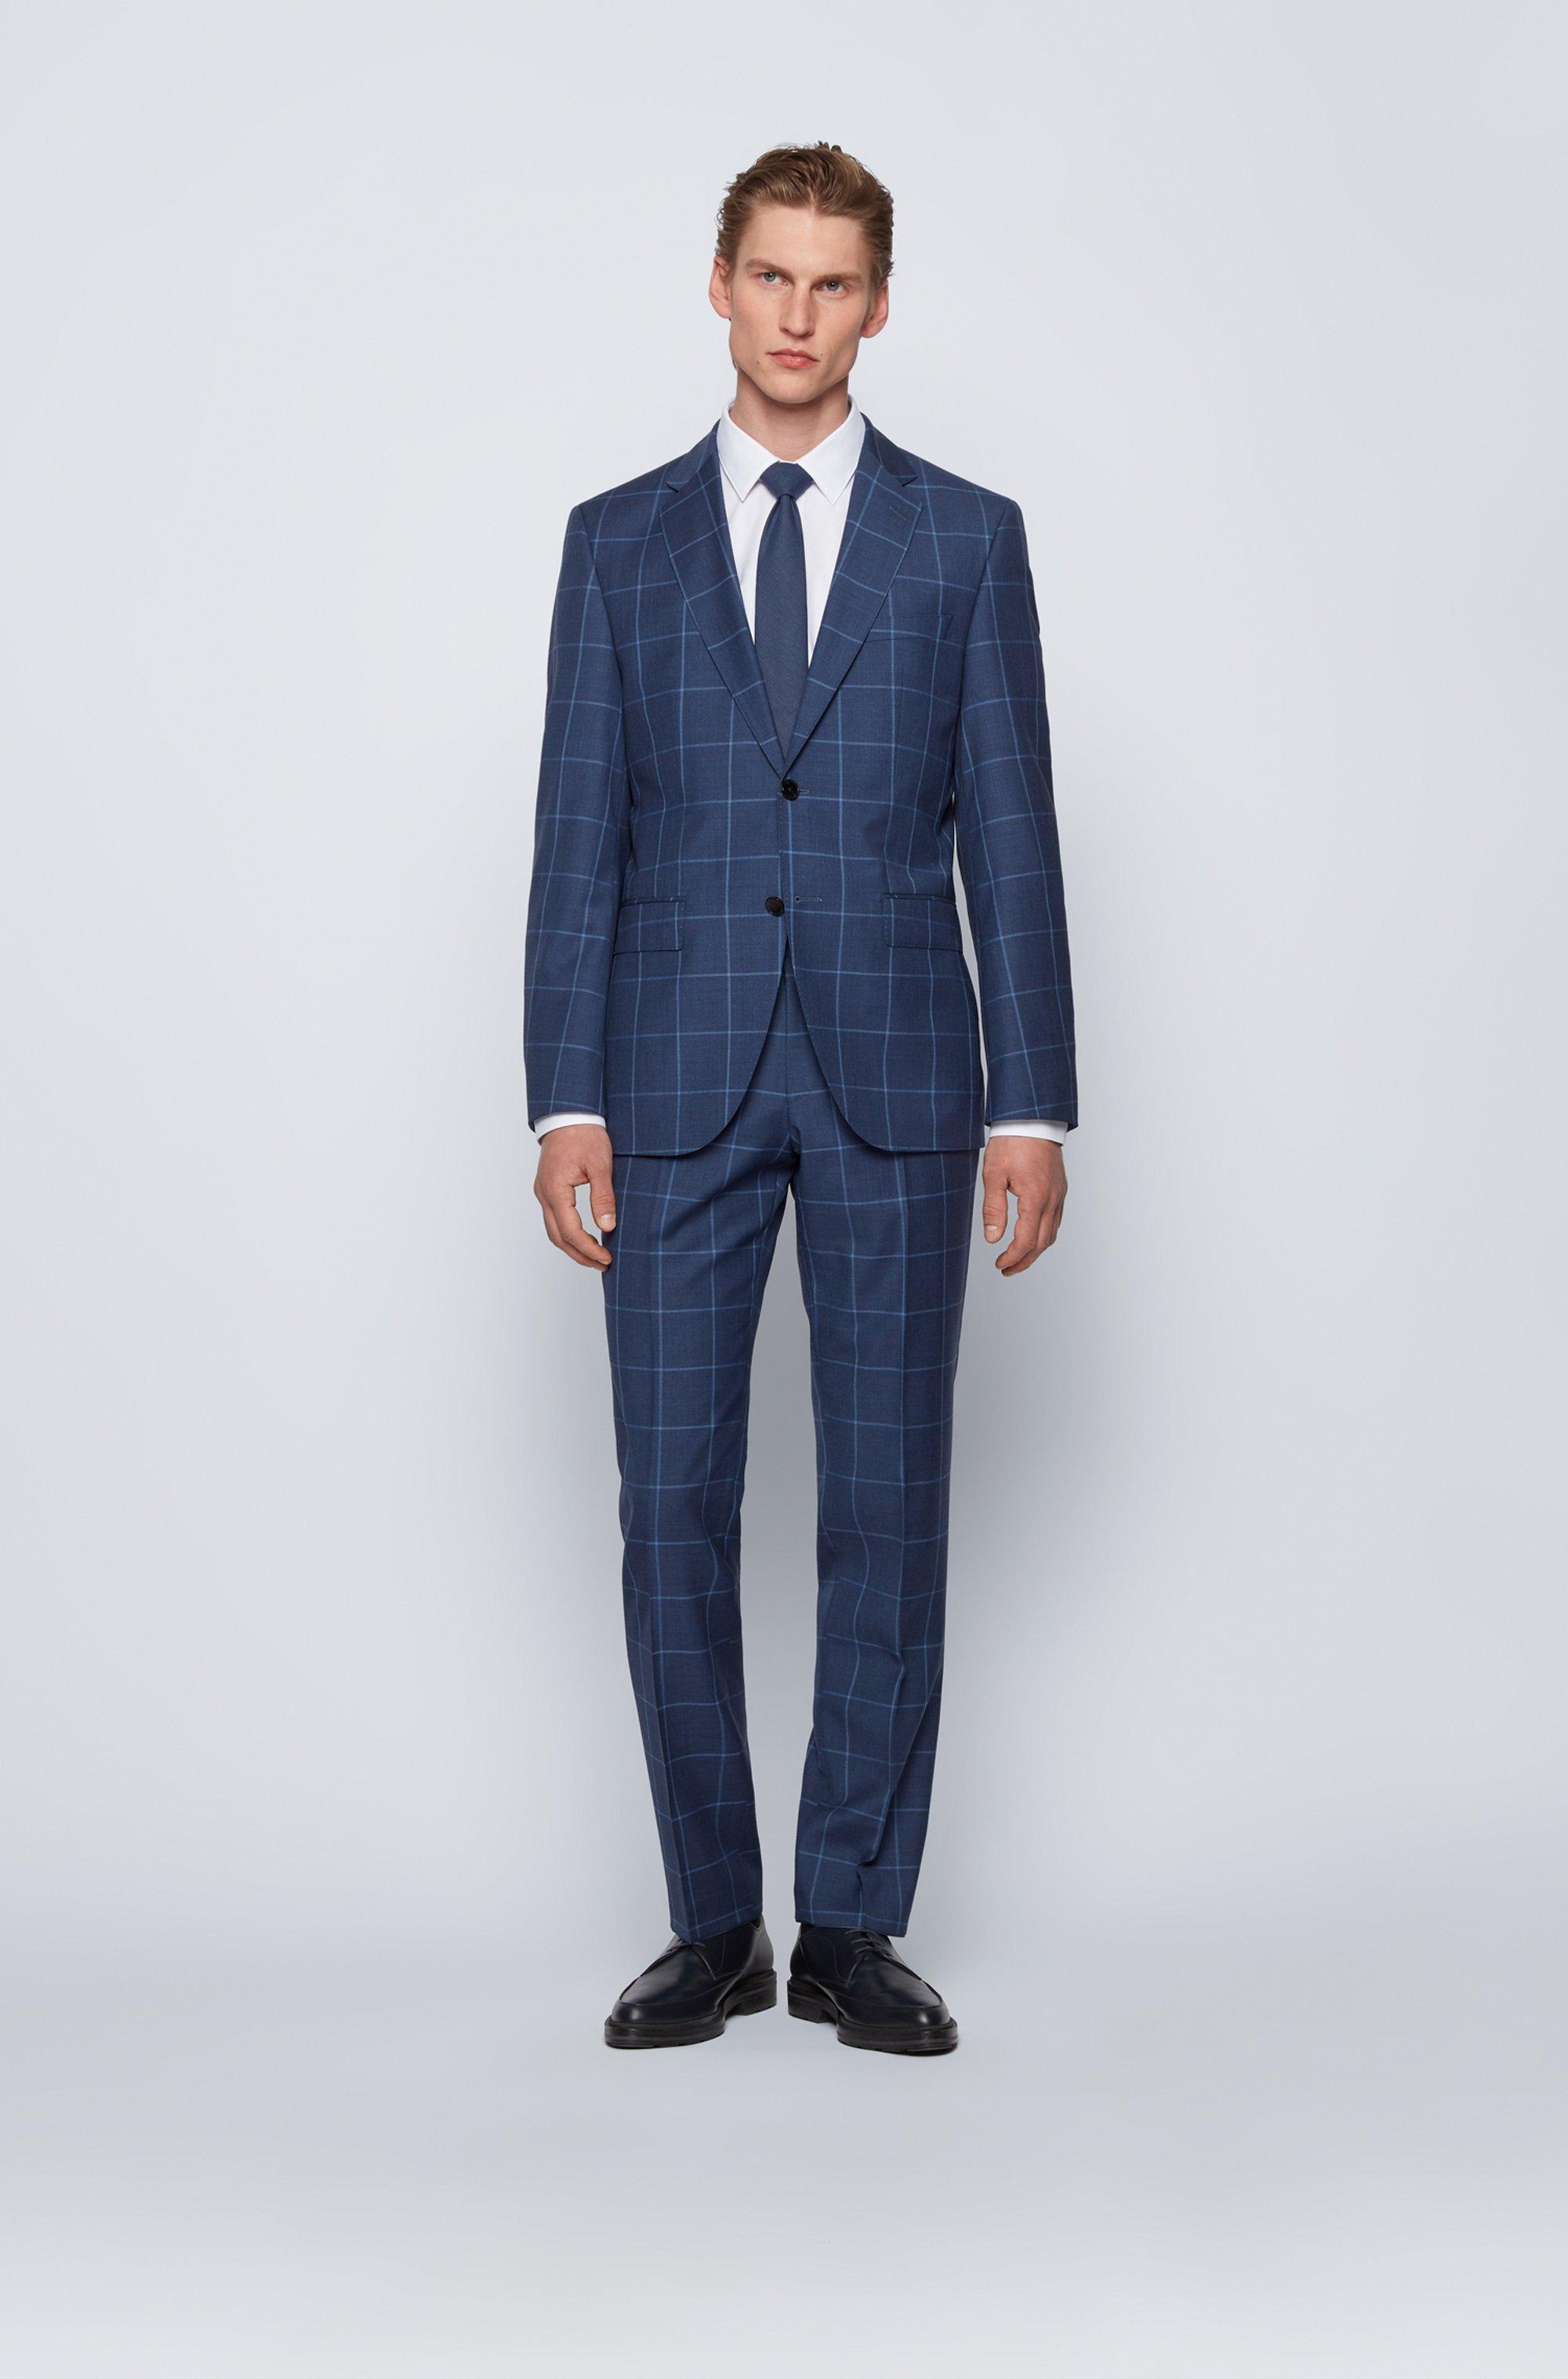 Regular-fit suit in plain-check virgin wool